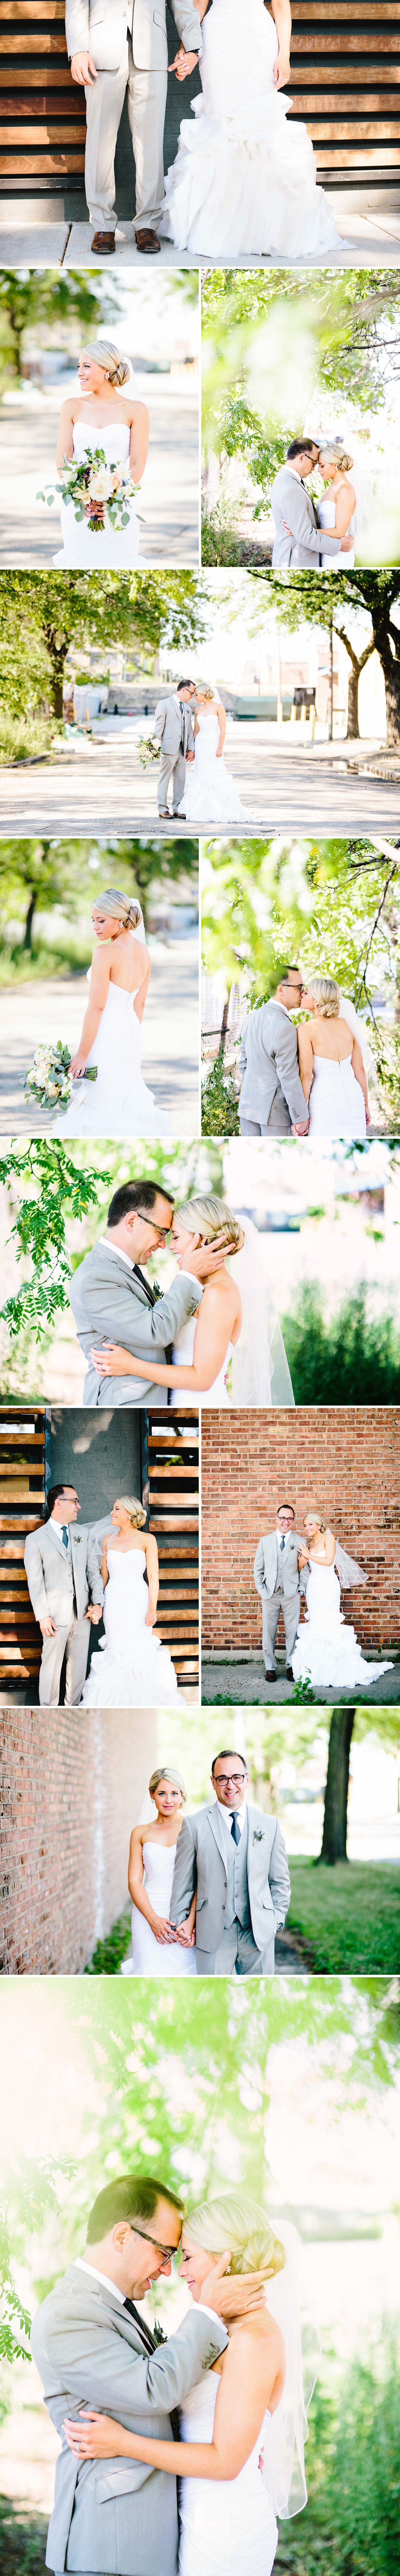 chicago-fine-art-wedding-photography-stratta7